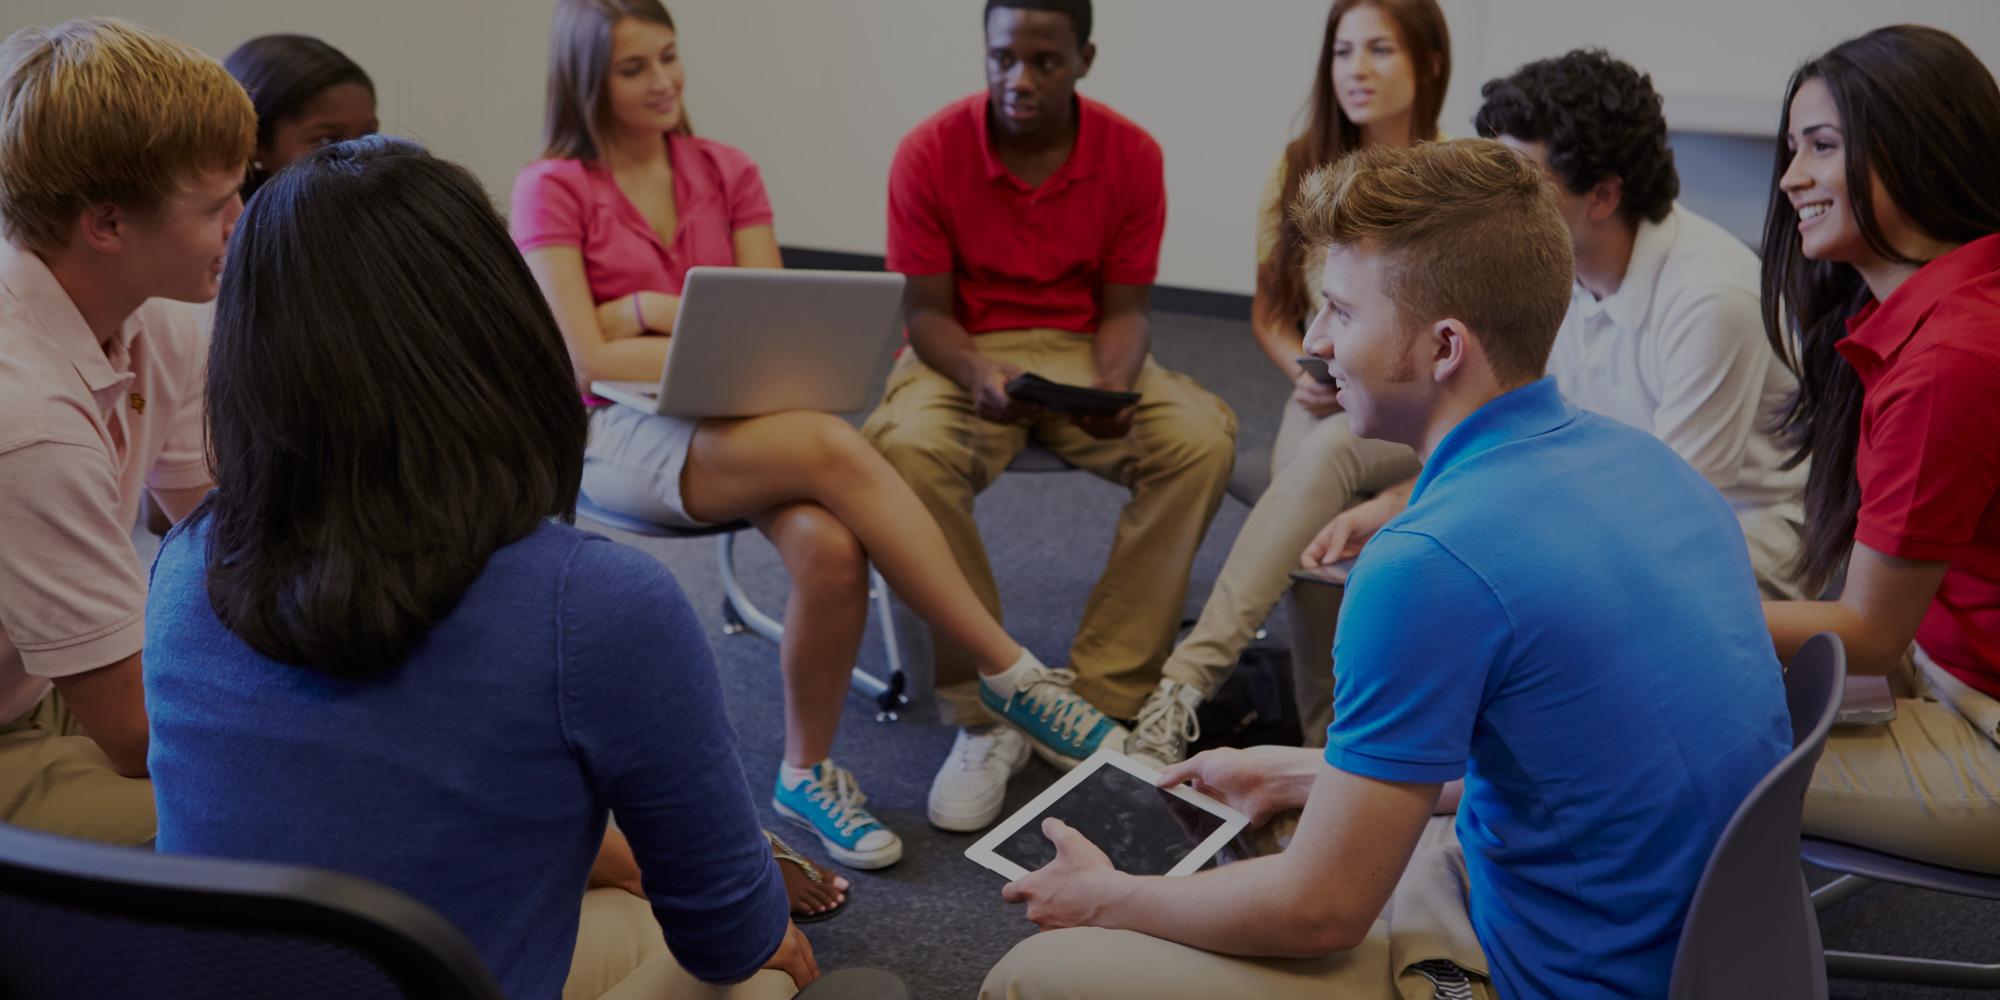 Groupe de jeunes qui discutent